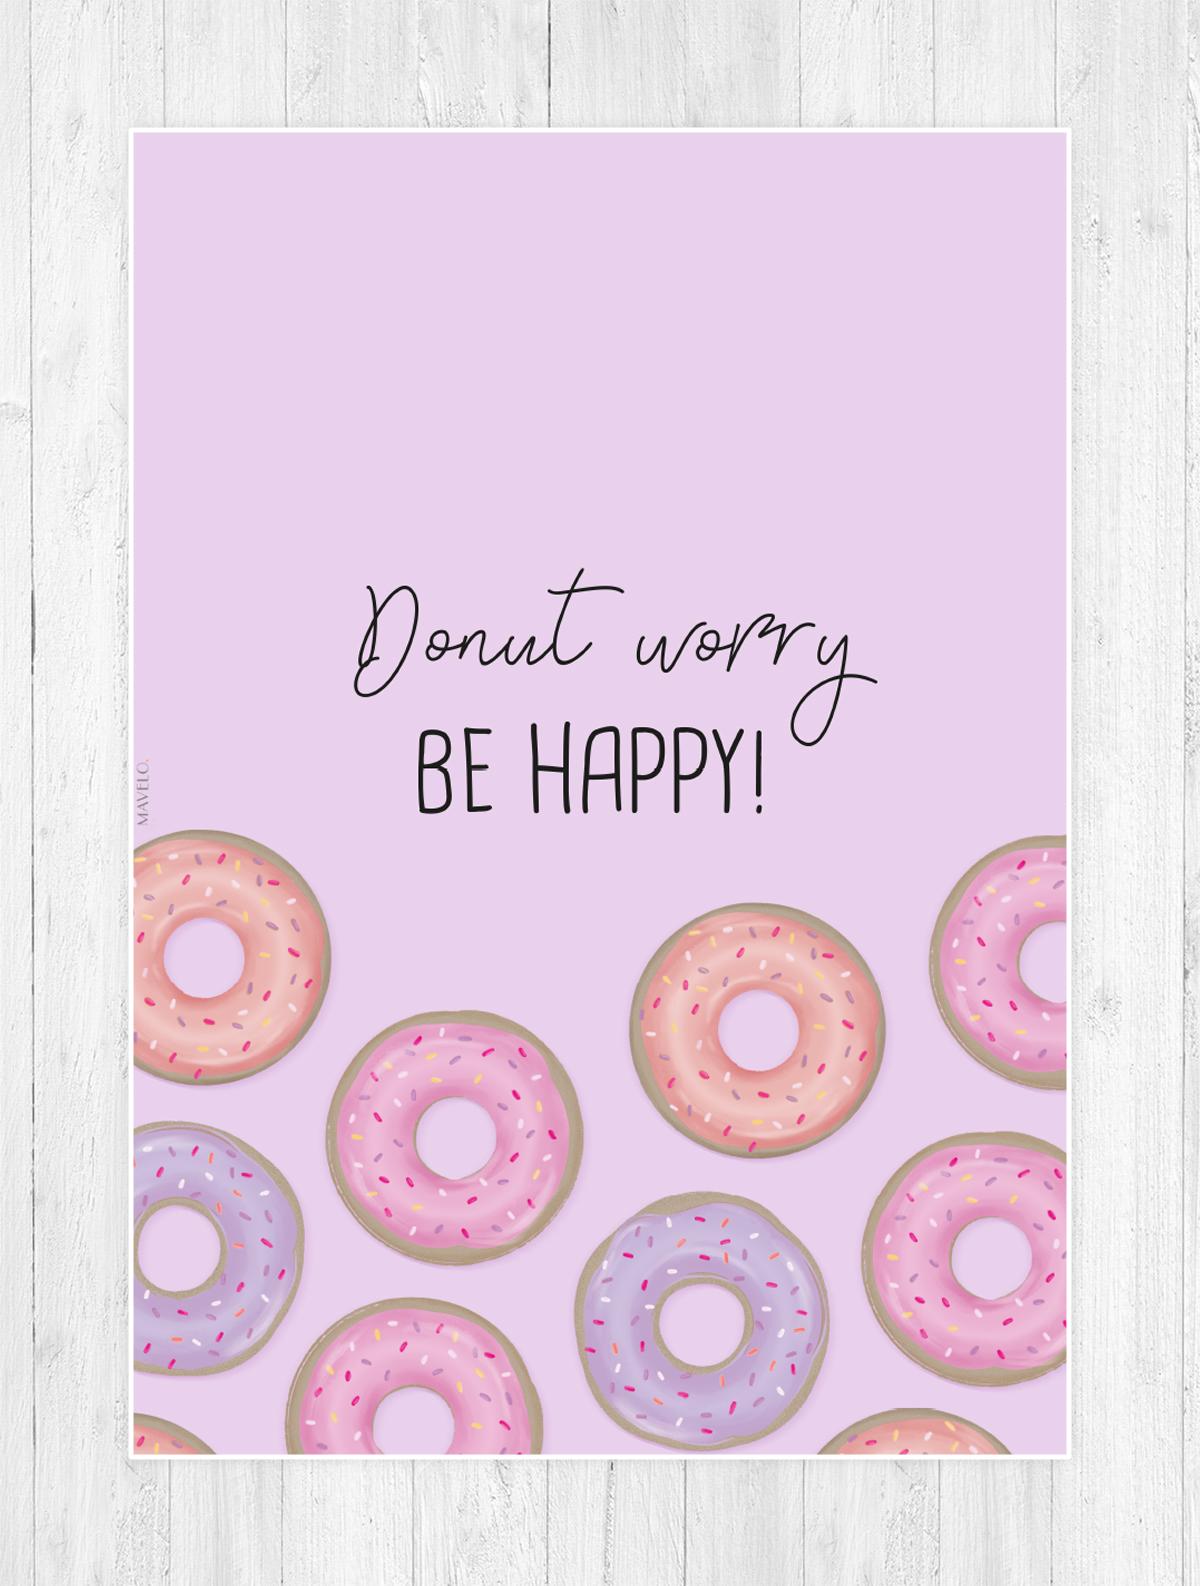 pastelowe plakaty / donut worry / free poster